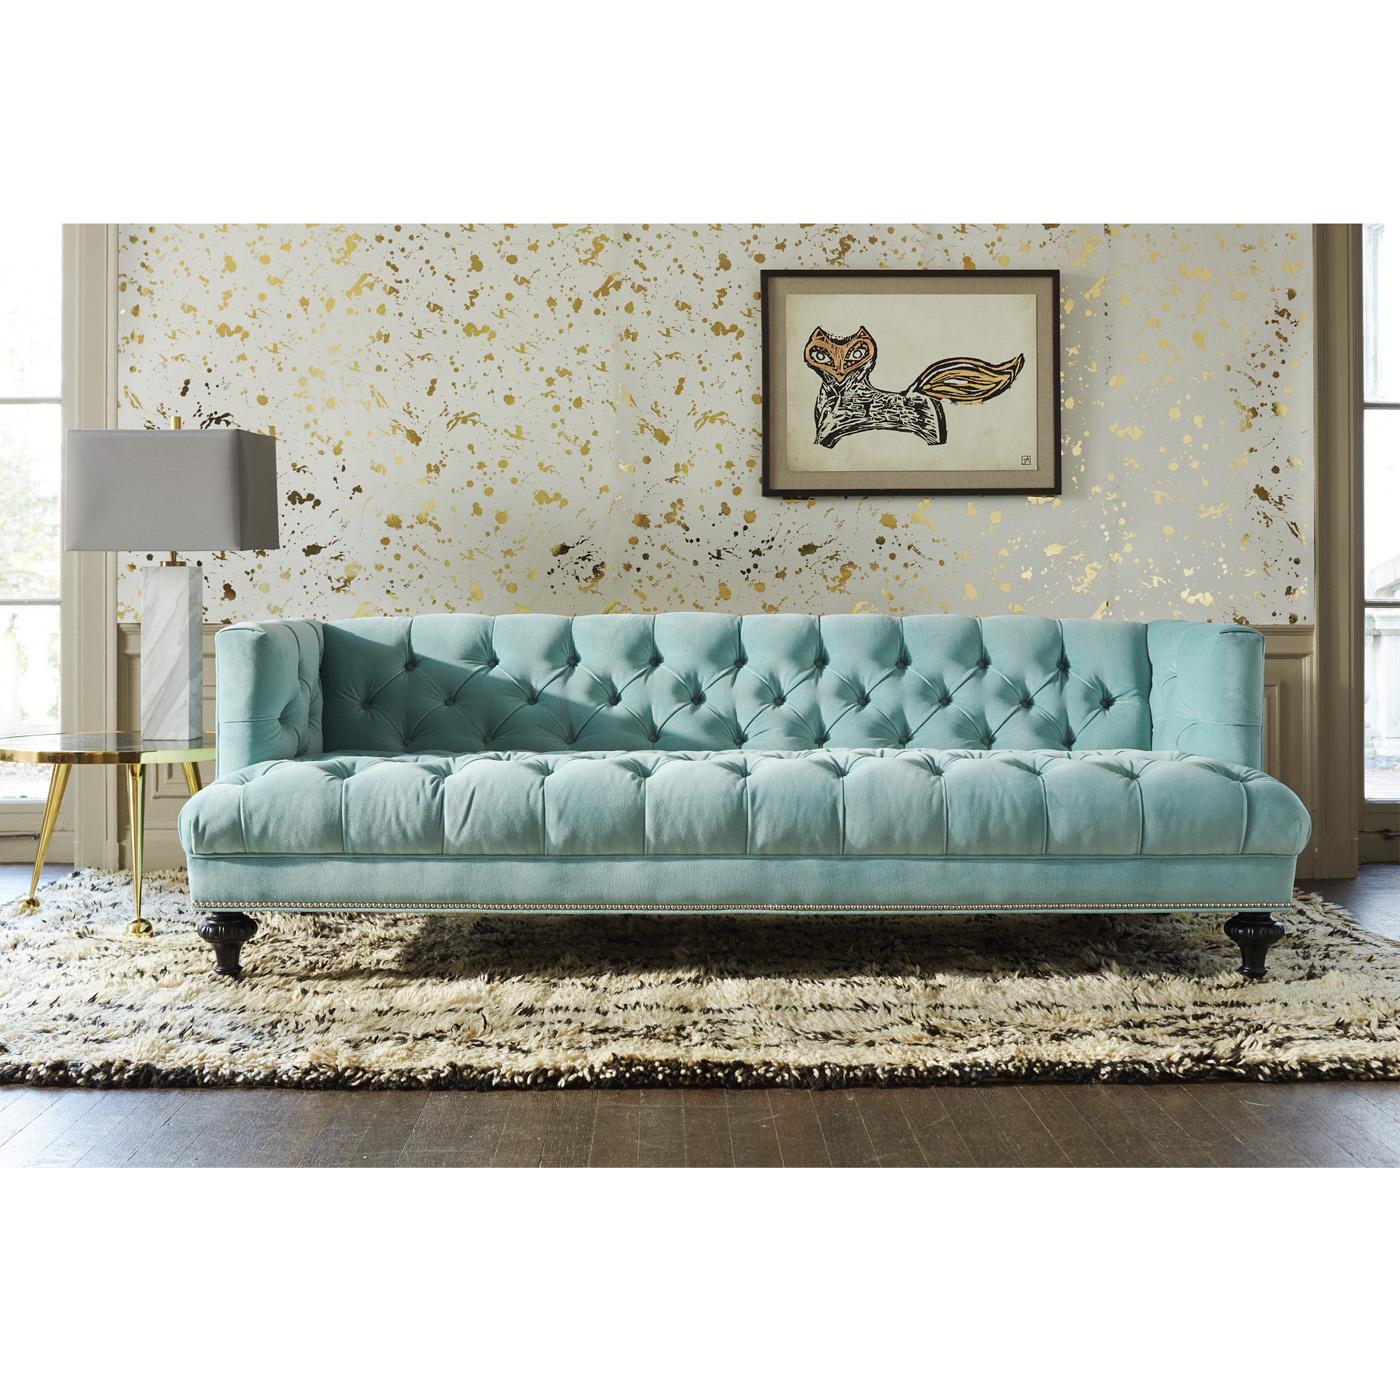 Modern Furniture Baxter Sofa Full Spr15 Jonathan Adler Susan